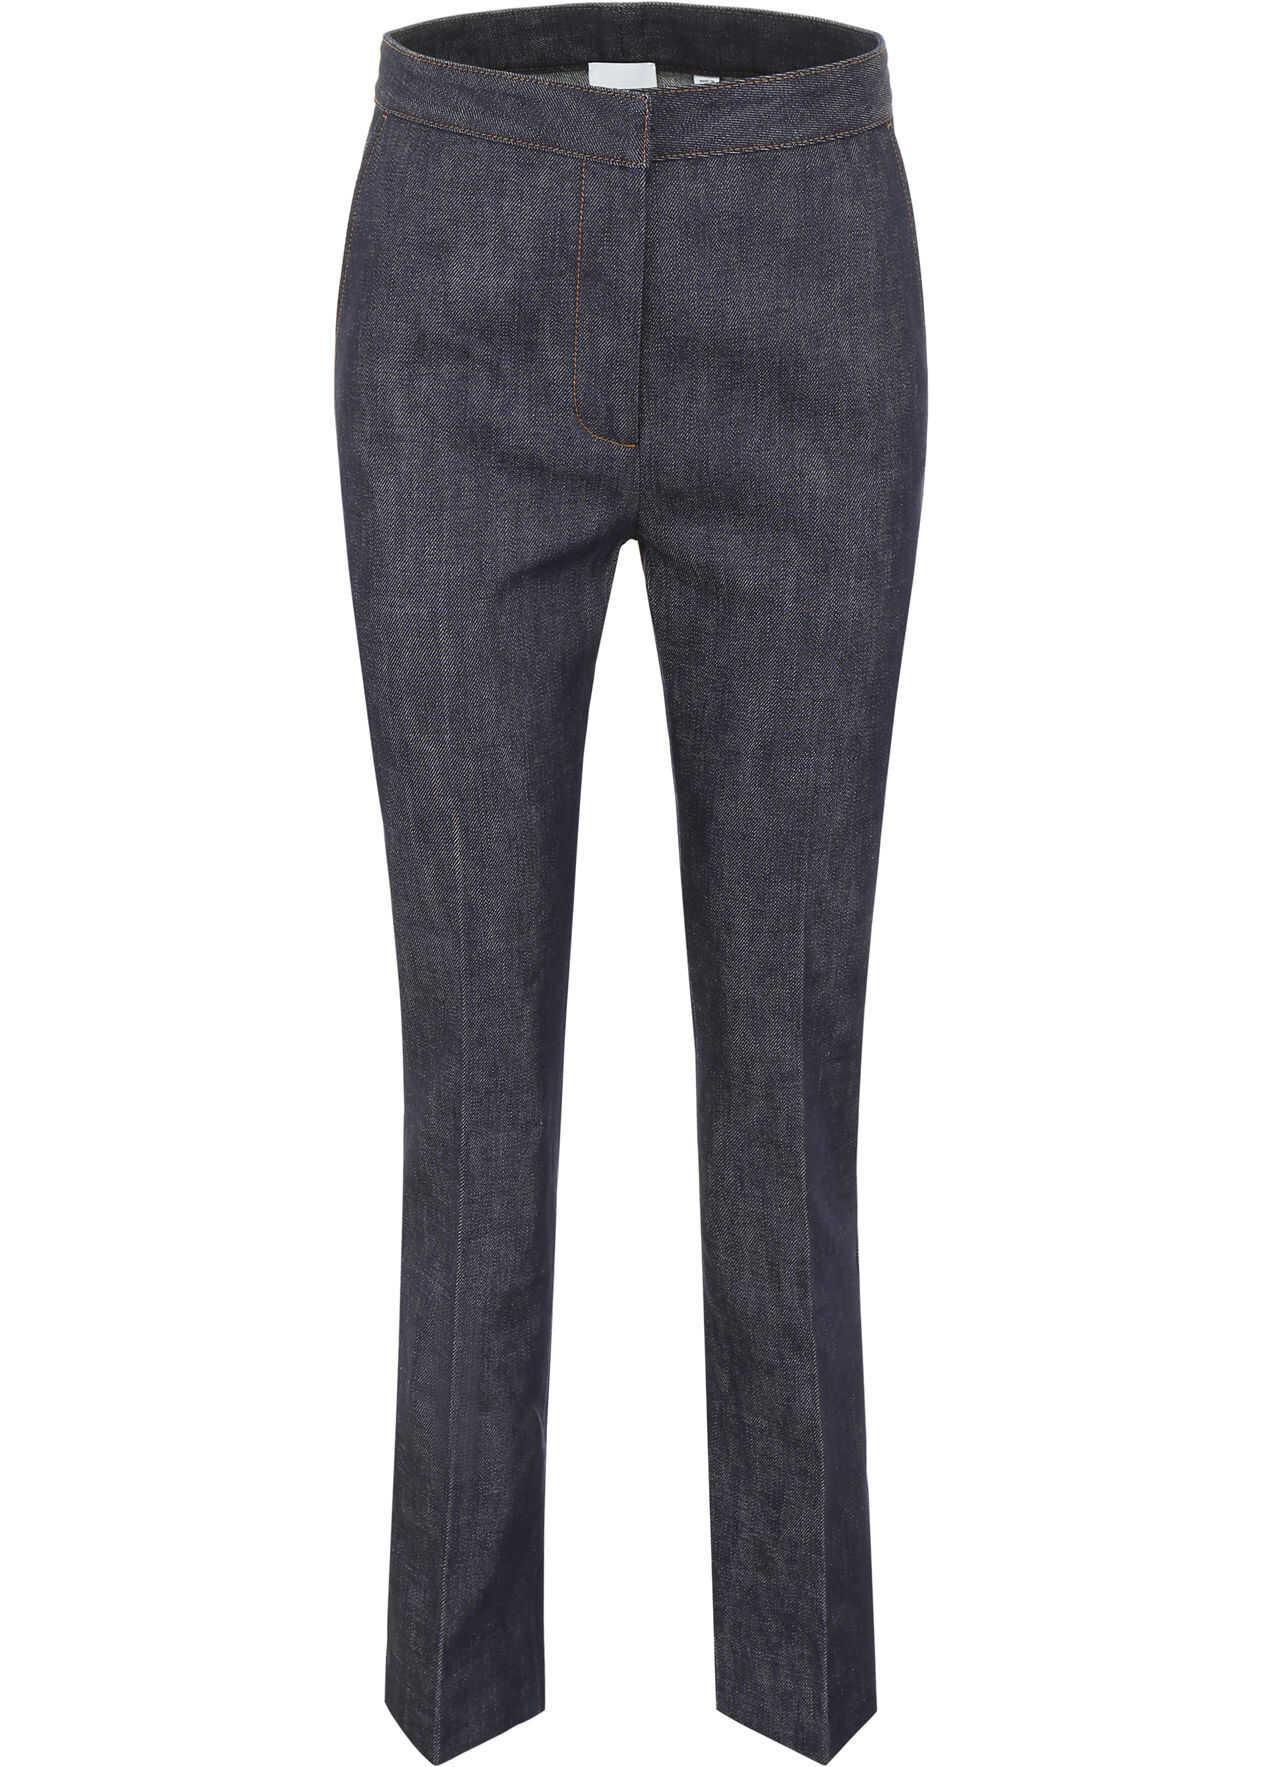 Burberry Straight-Leg Jeans INDIGO